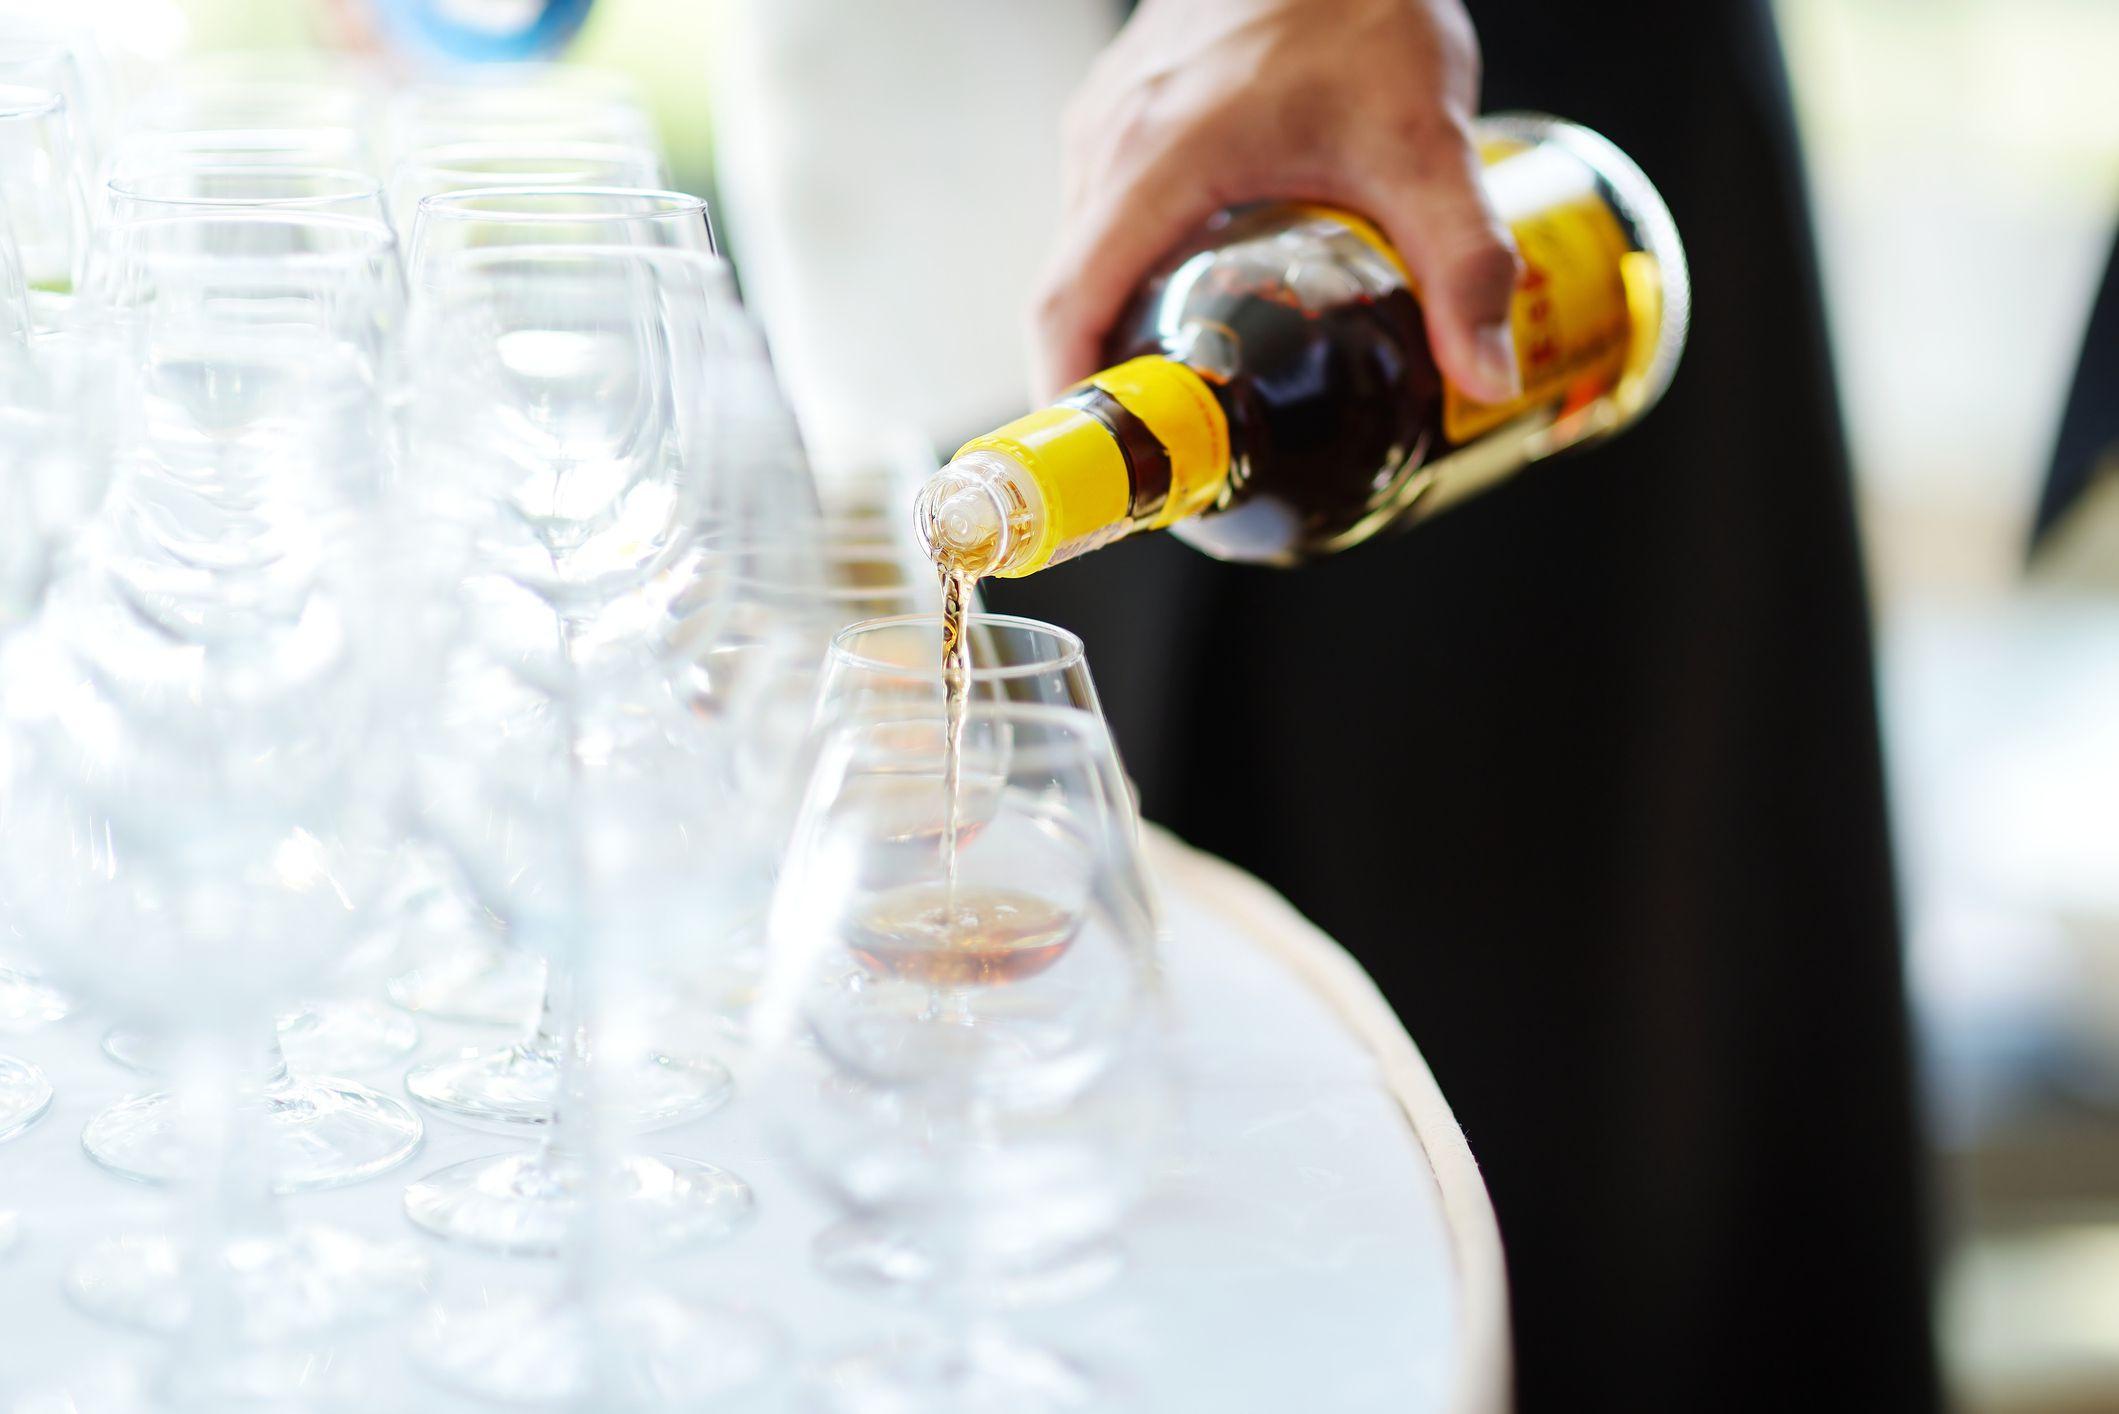 Hand pouring liquor into glasses